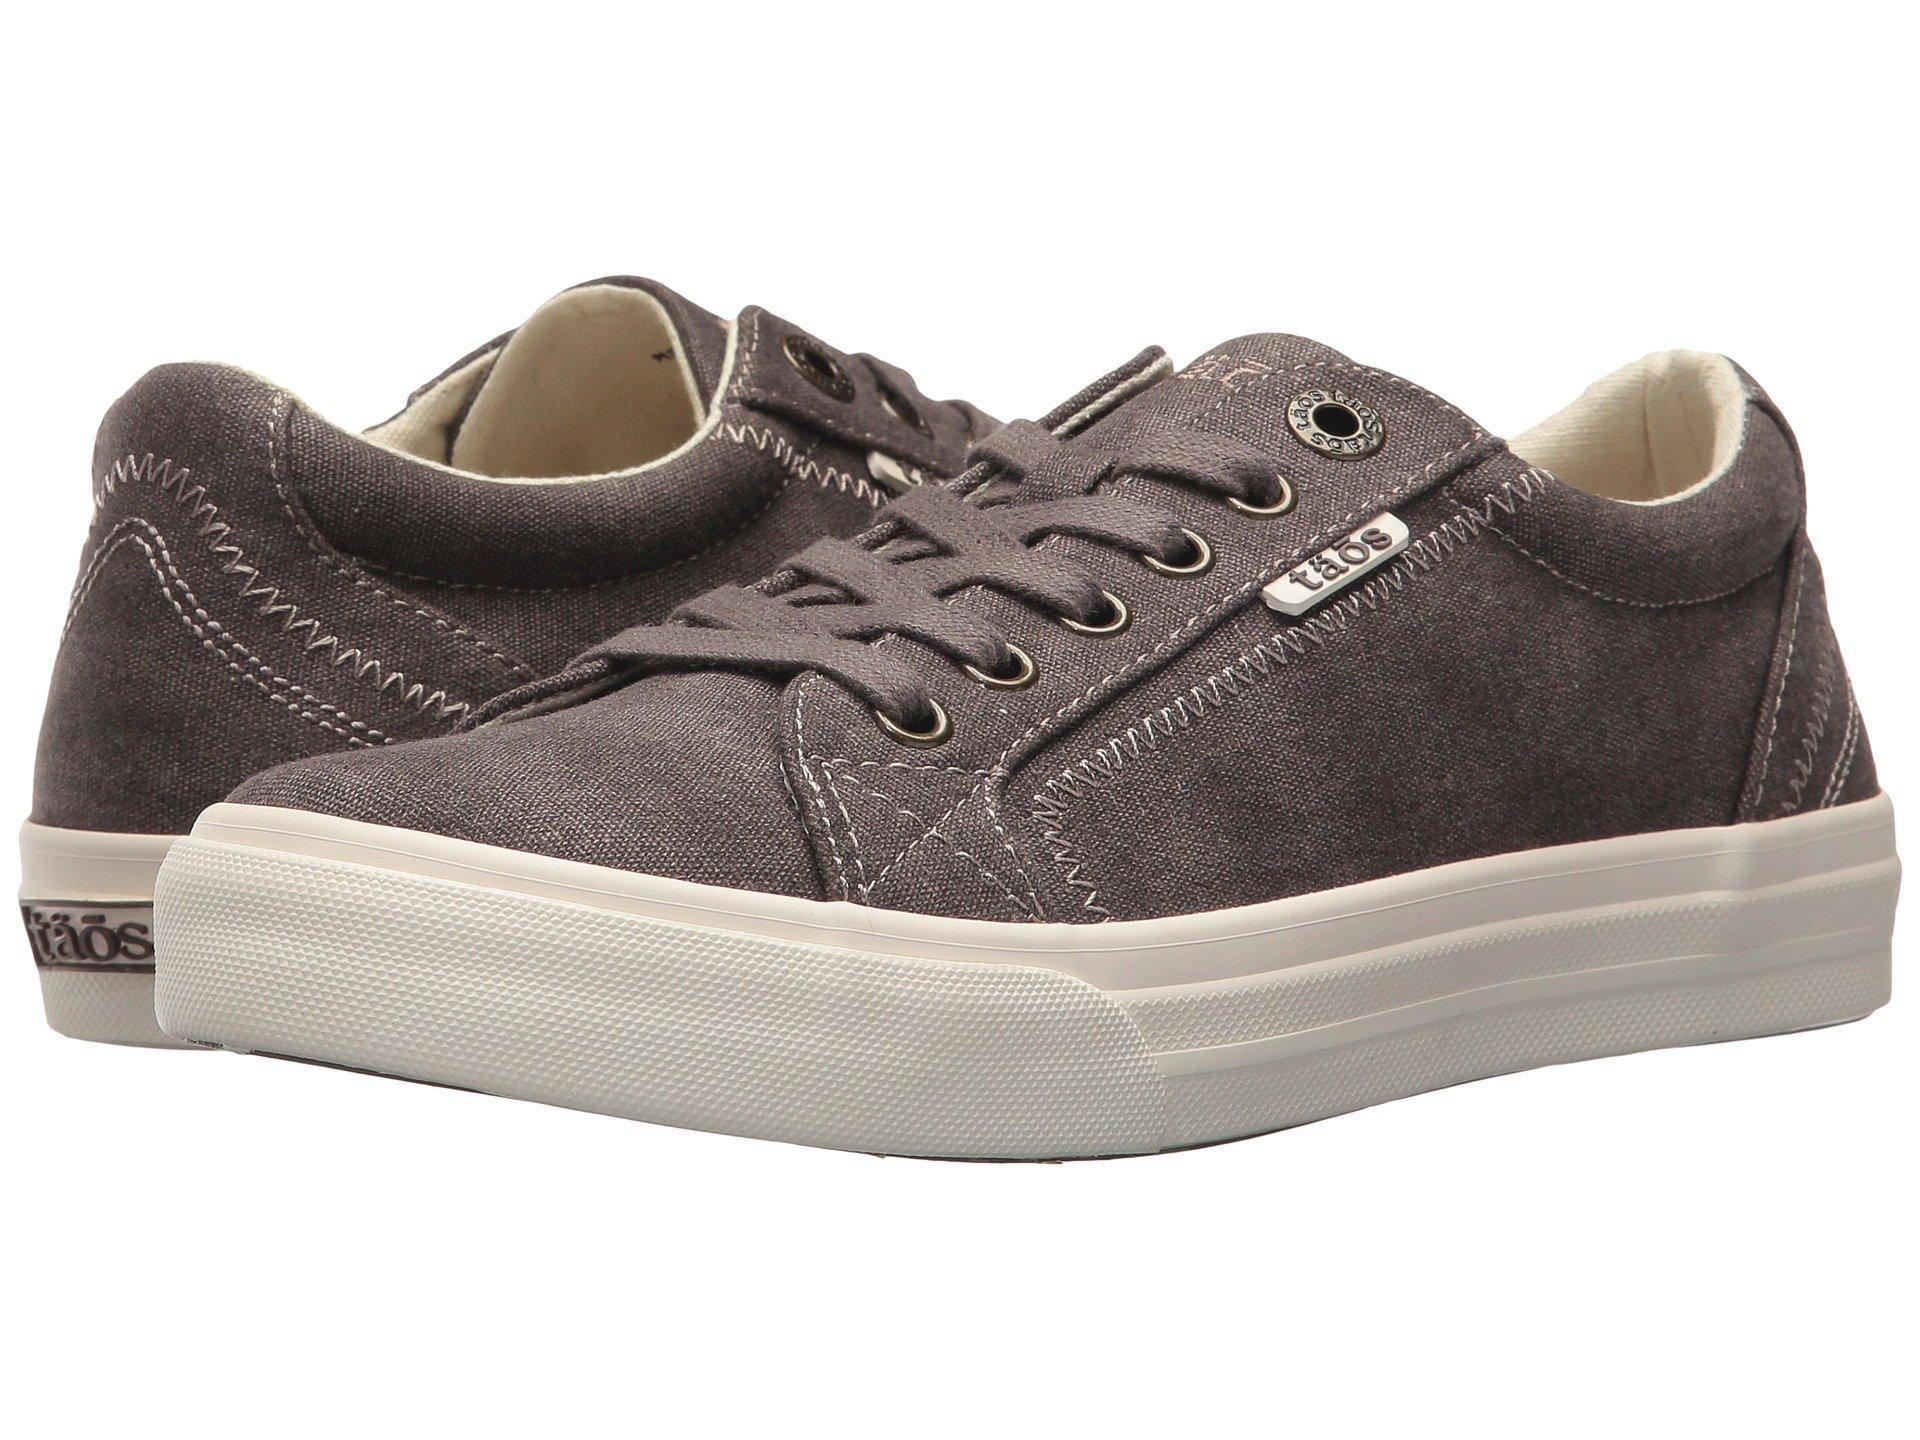 8352be1f640c Taos Footwear. Plim Soul (black Tropical Vintage Print) Women s Shoes